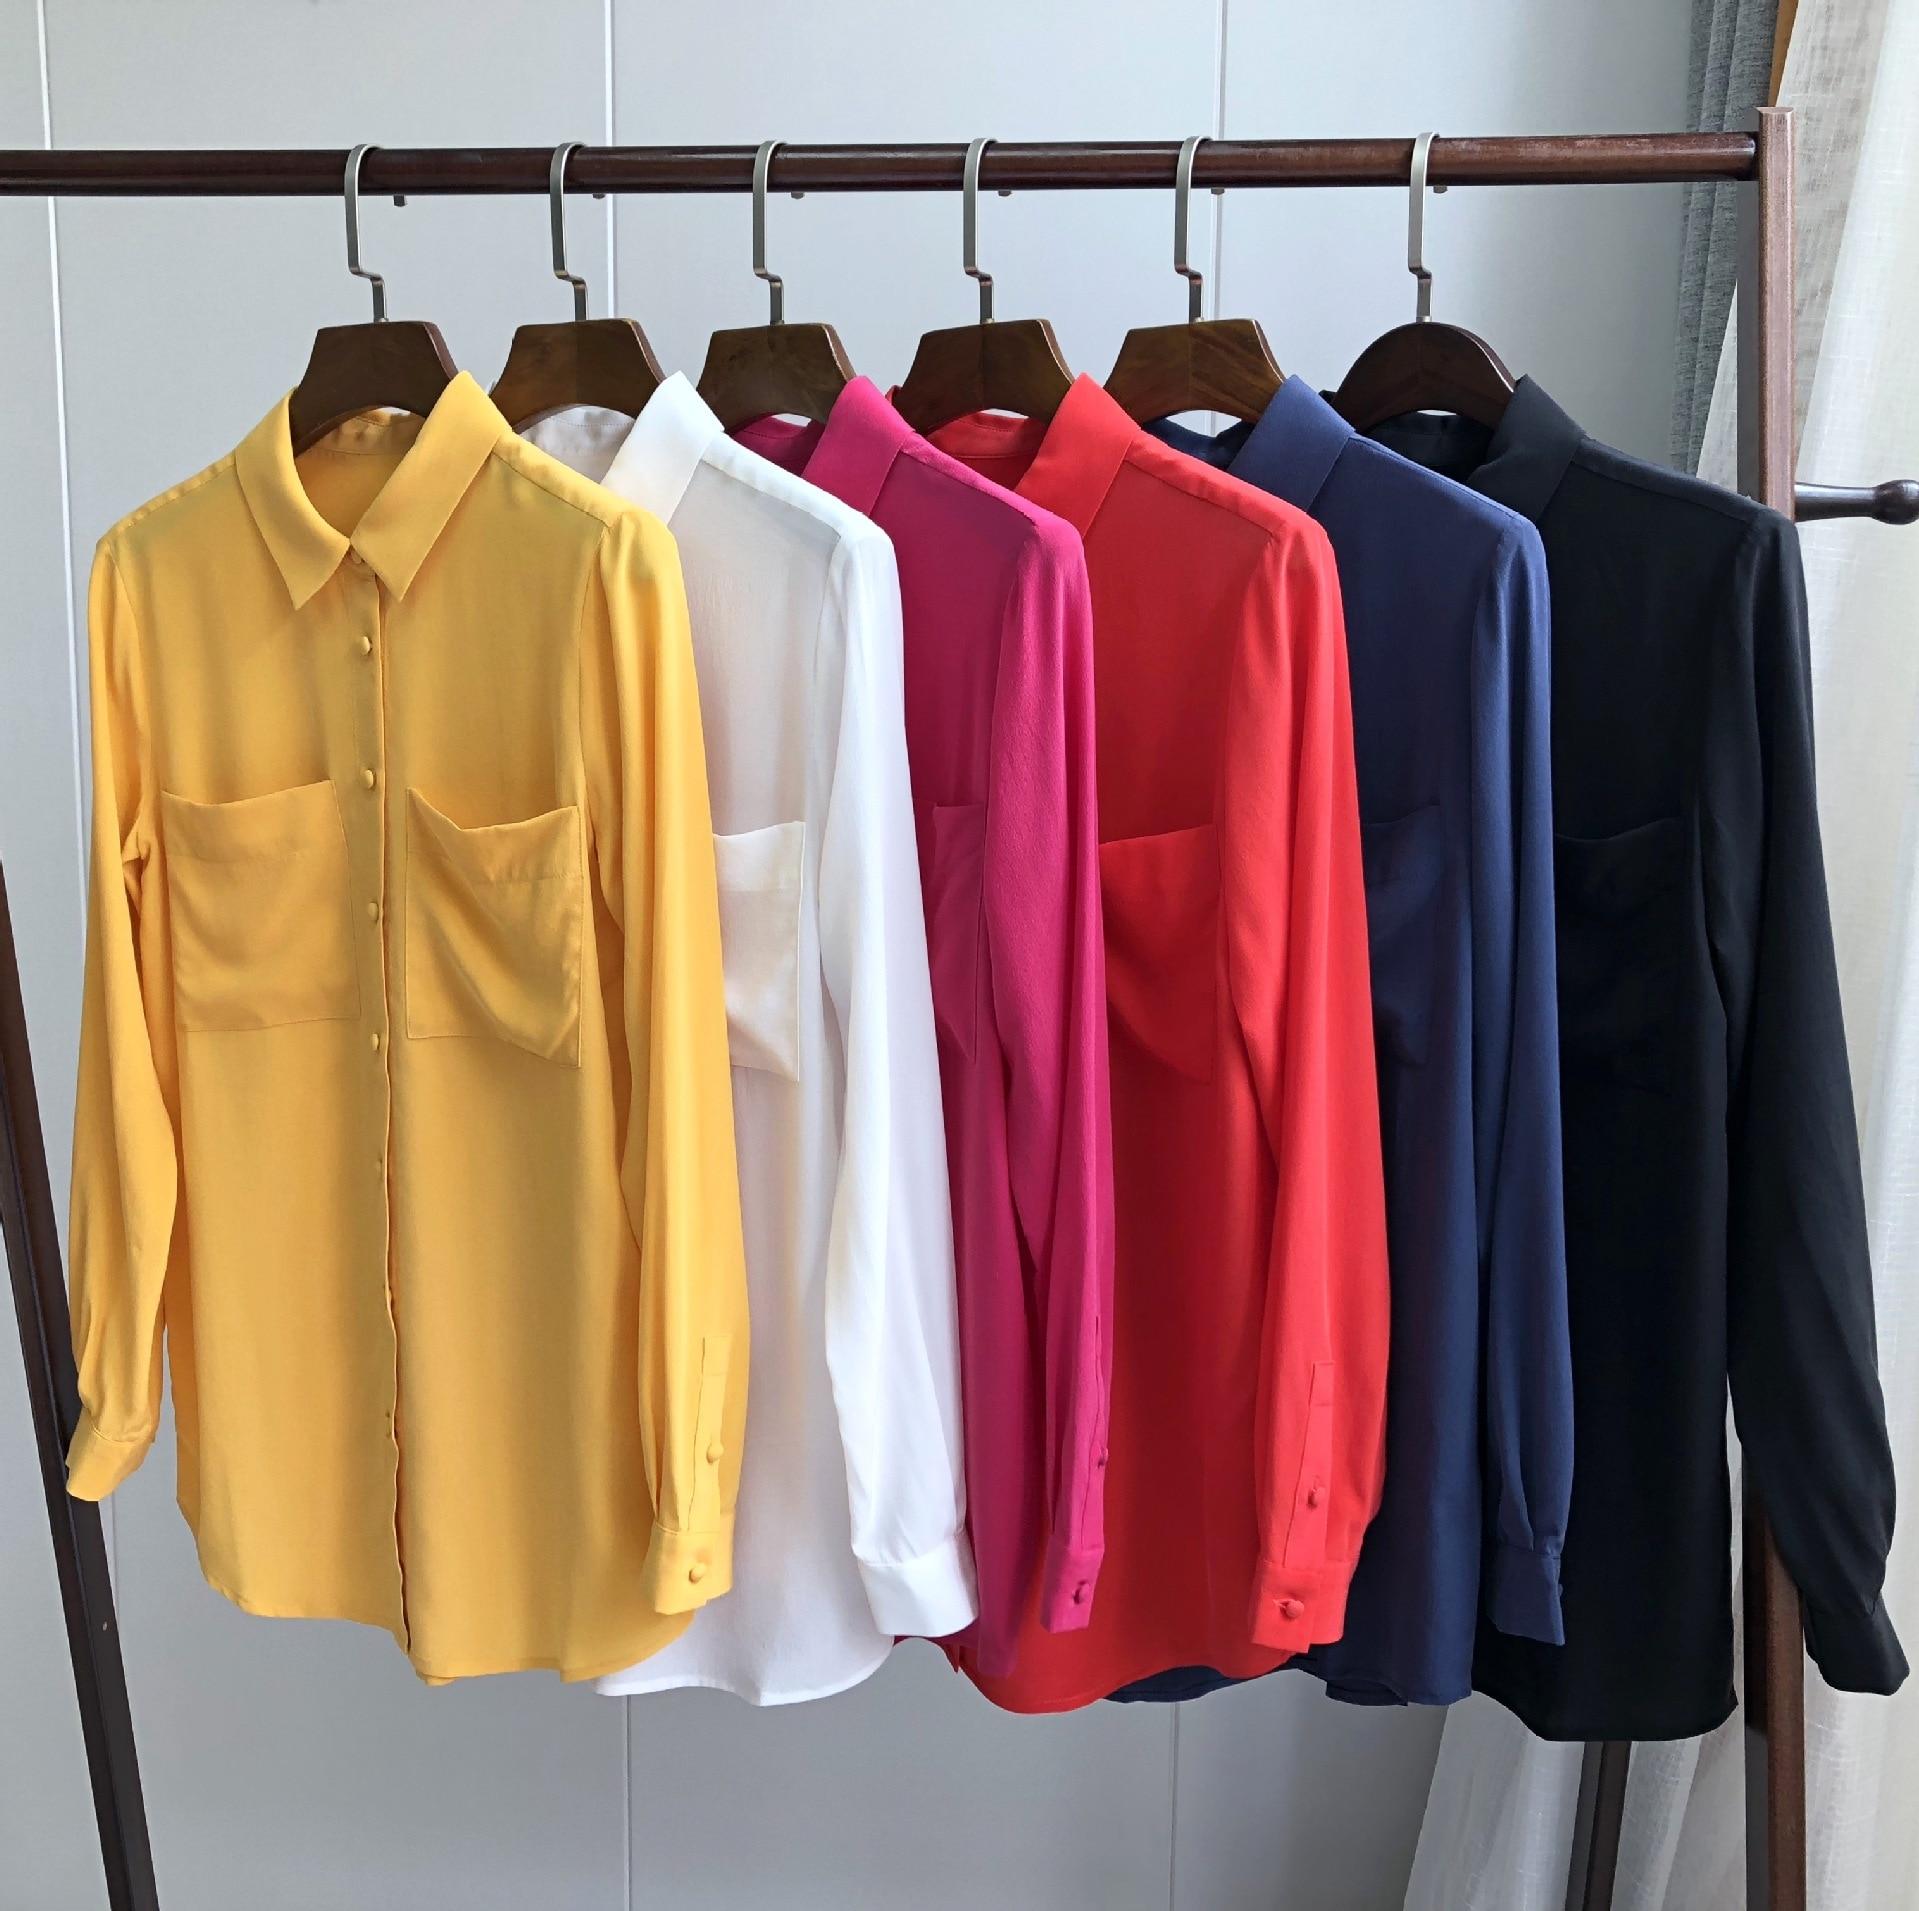 Sand washed silk crepe shirt simple double pocket elegant clasp silk shirt белая рубашка с объемными рукавами и вырезом